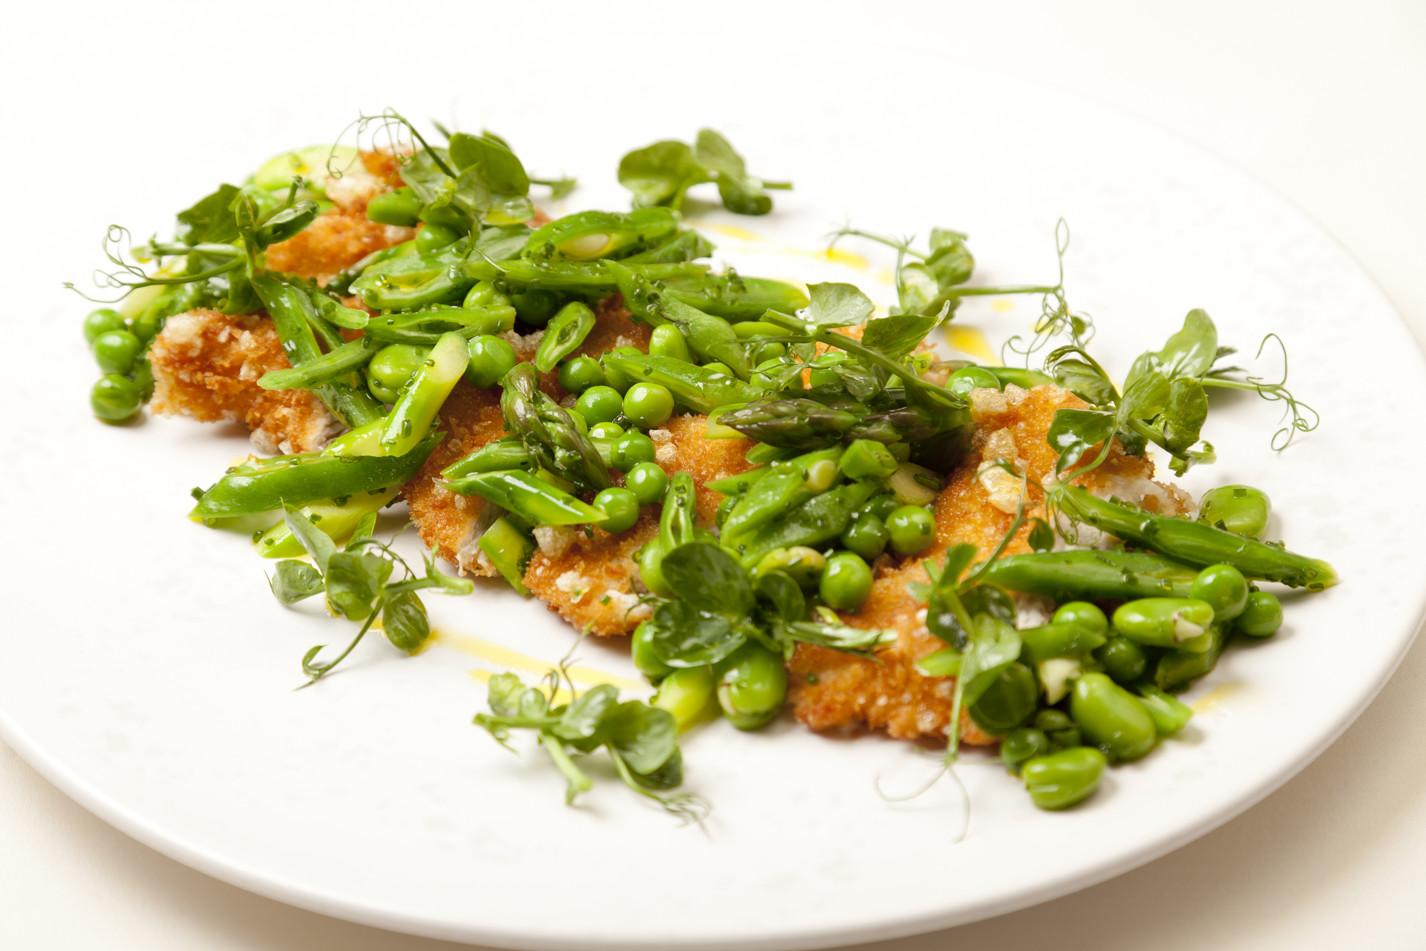 Panko-crumbed turkey salad of spring greens, honey and lavender dressing